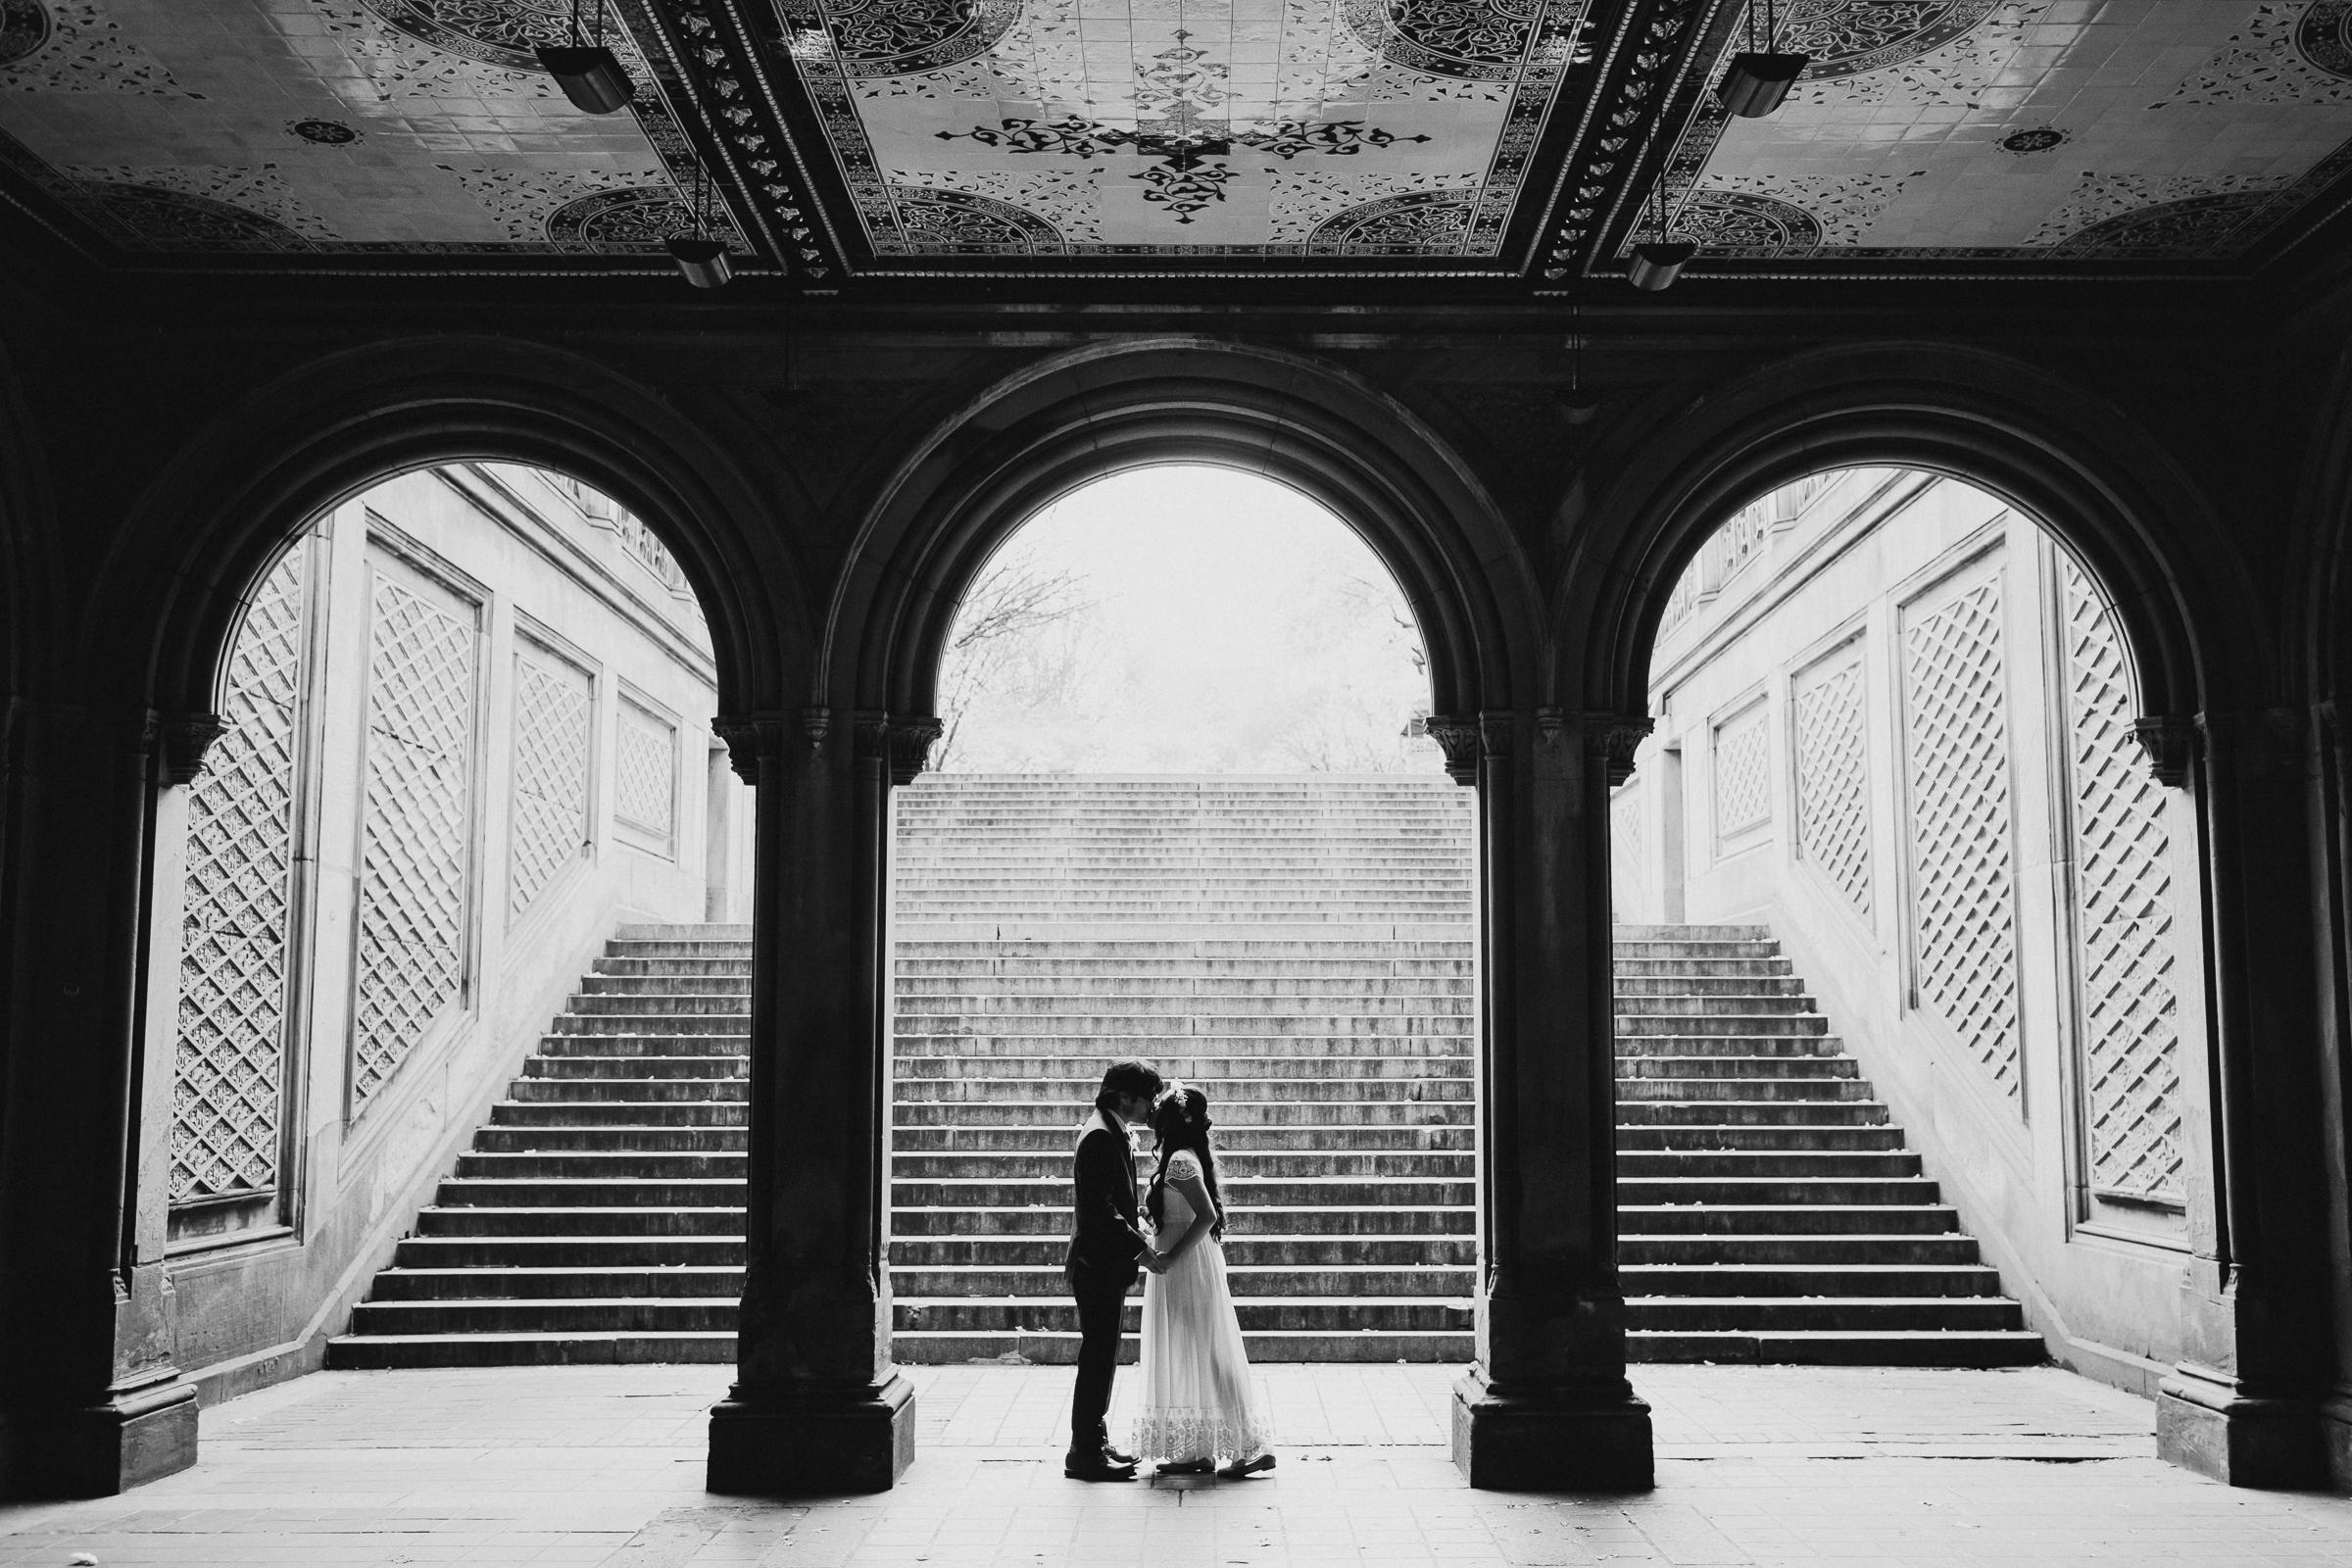 Central-Park-Brooklyn-Bridge-Dumbo-NYC-Documentary-Wedding-Photographer-41.jpg